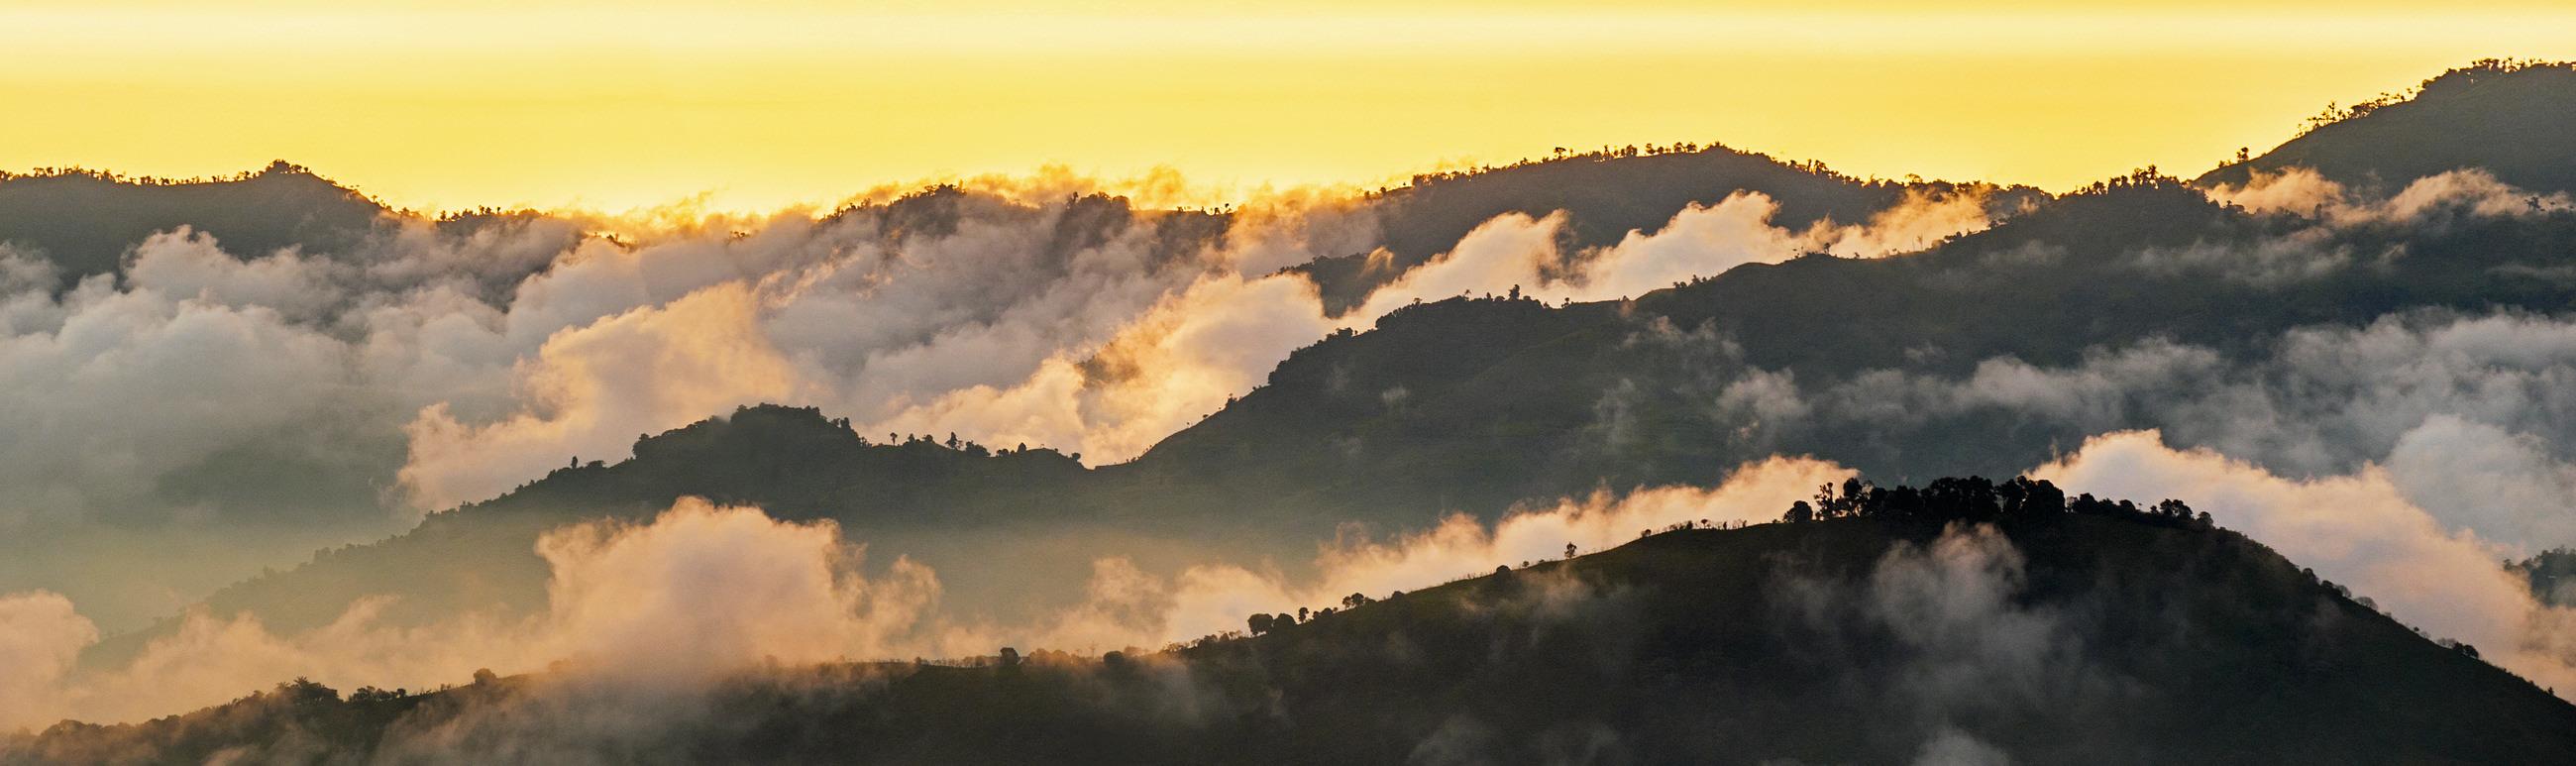 Cordillera Andes Reizen